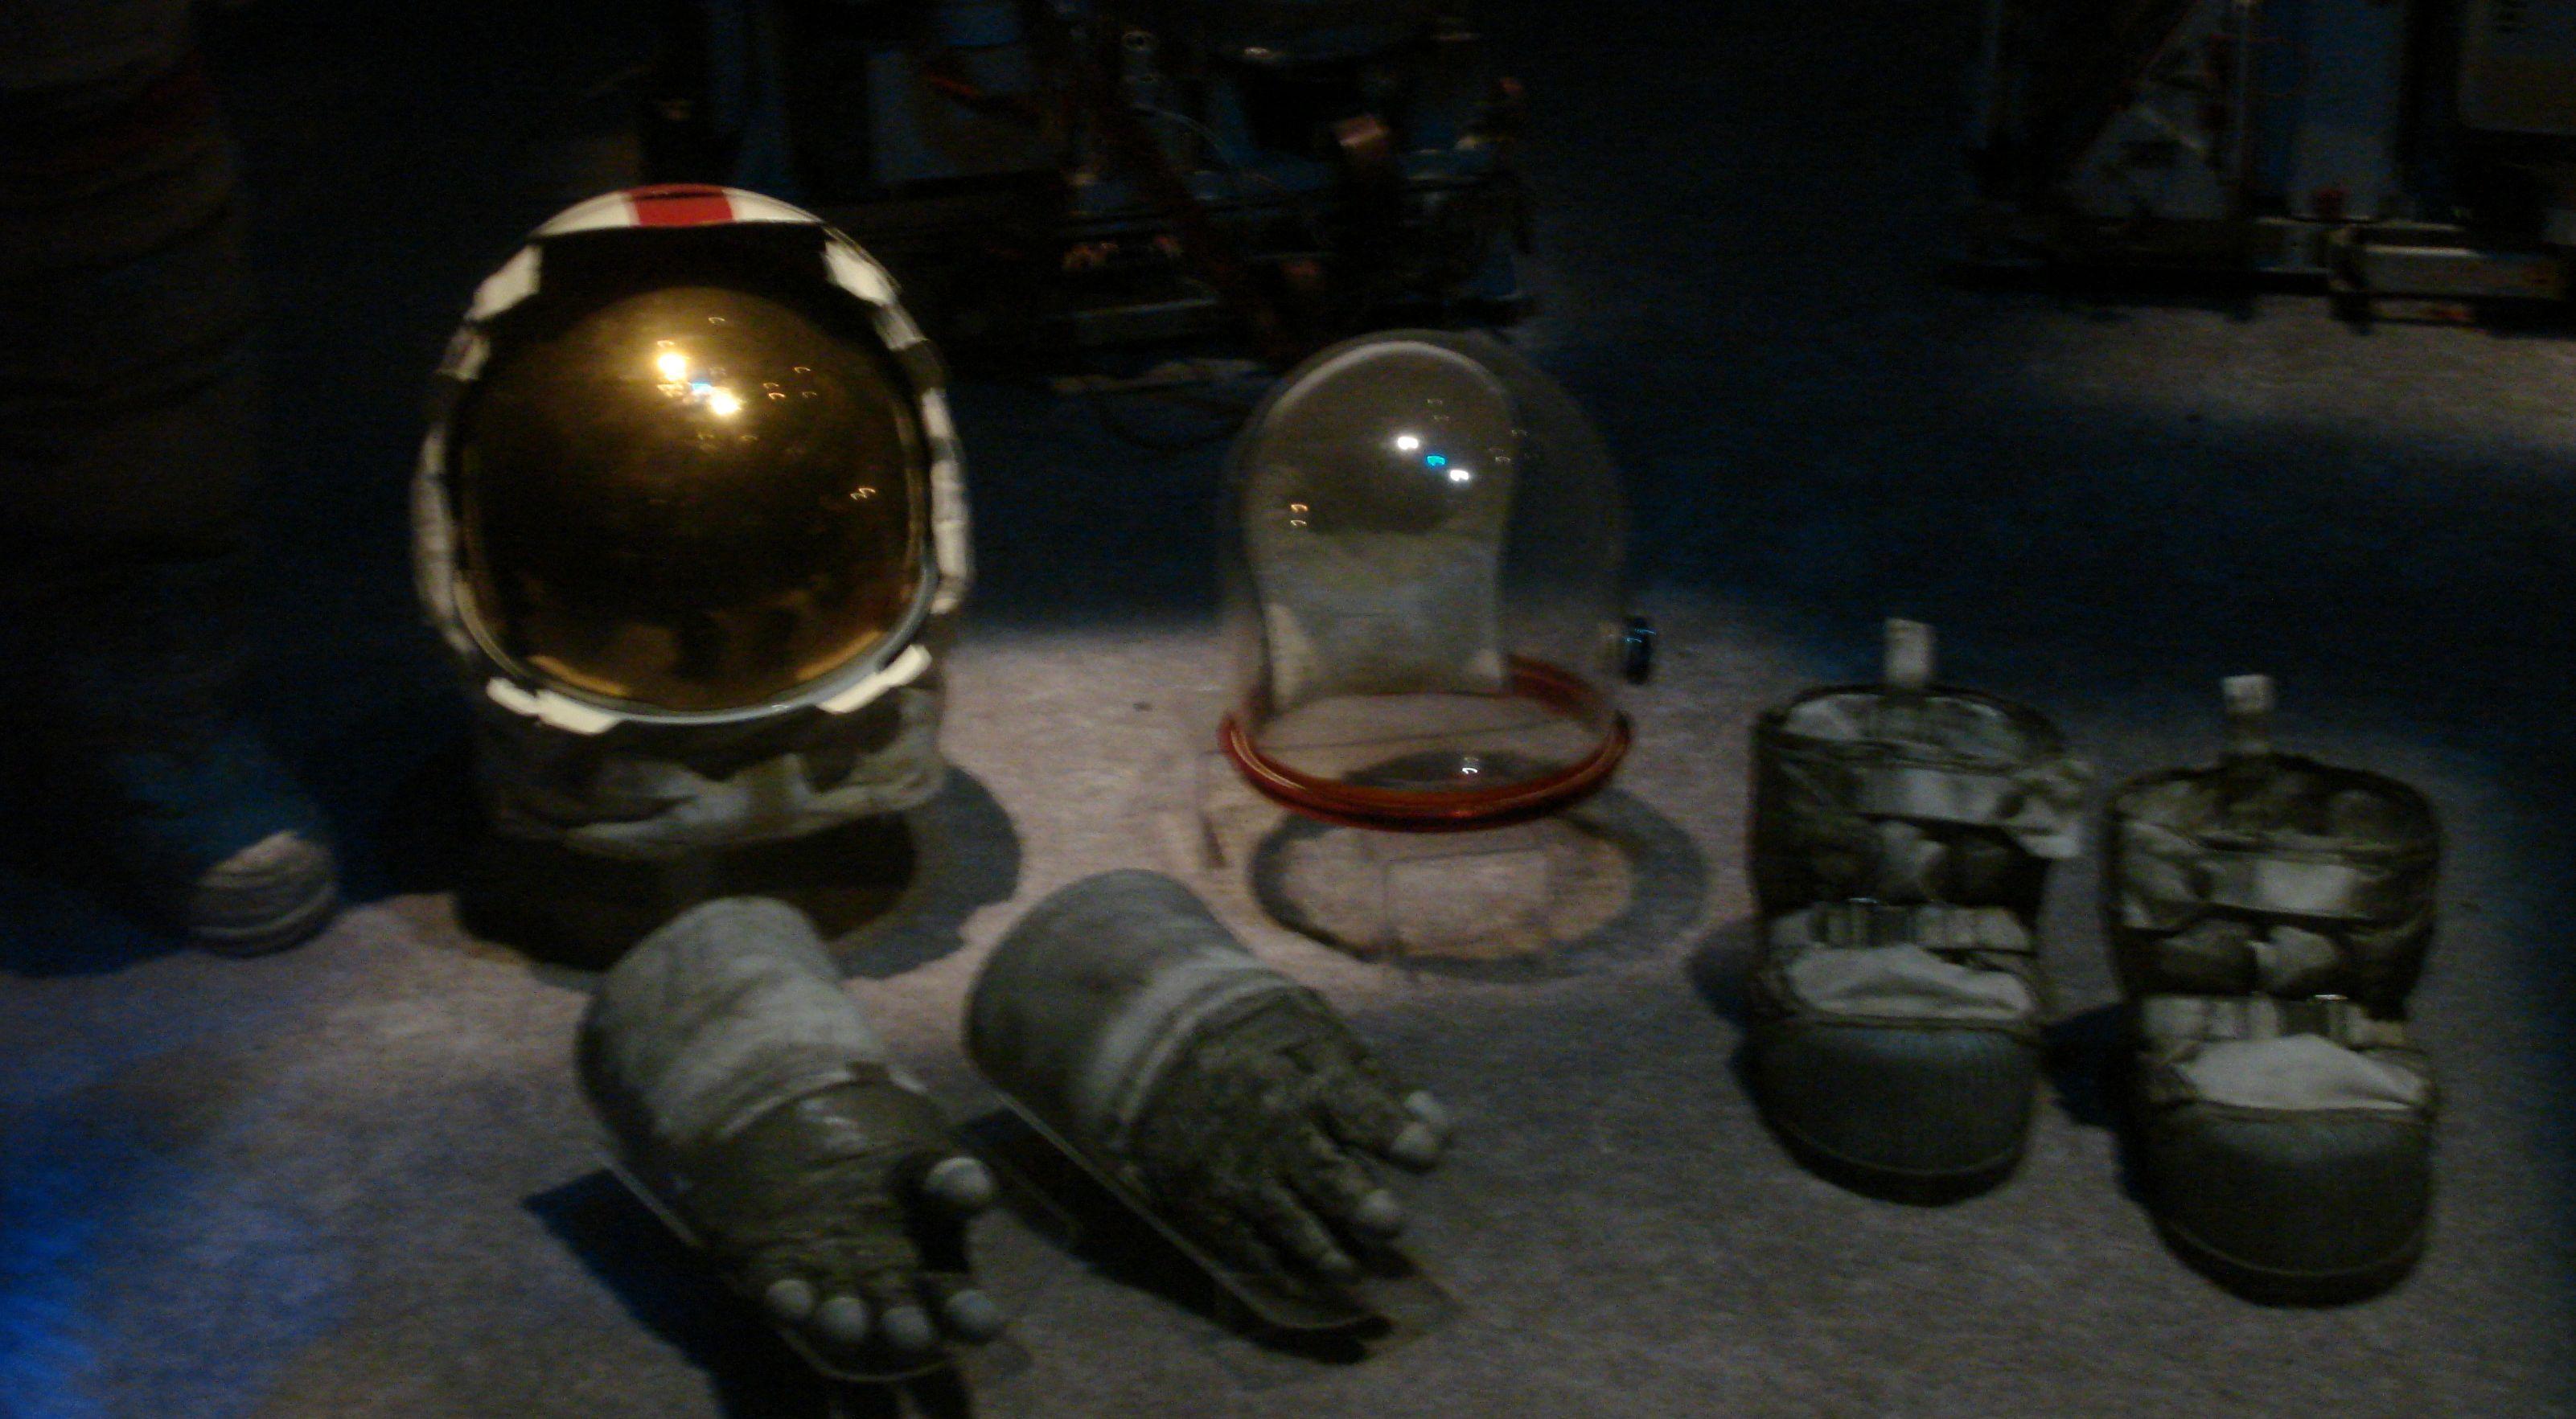 astronaut tools - photo #2